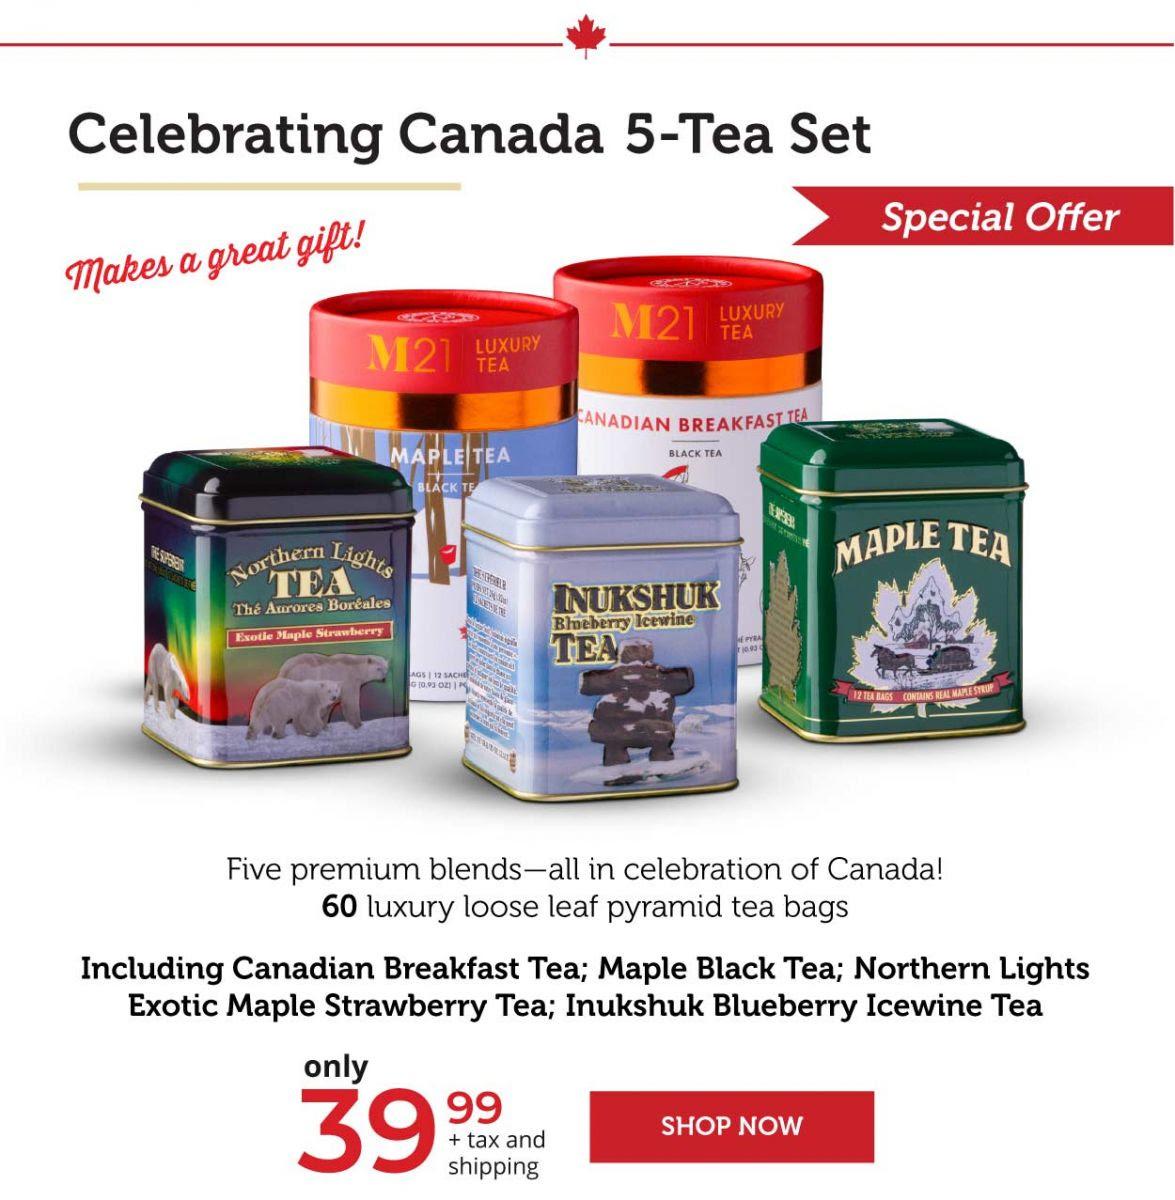 Celebrating Canada 5-Tea Set